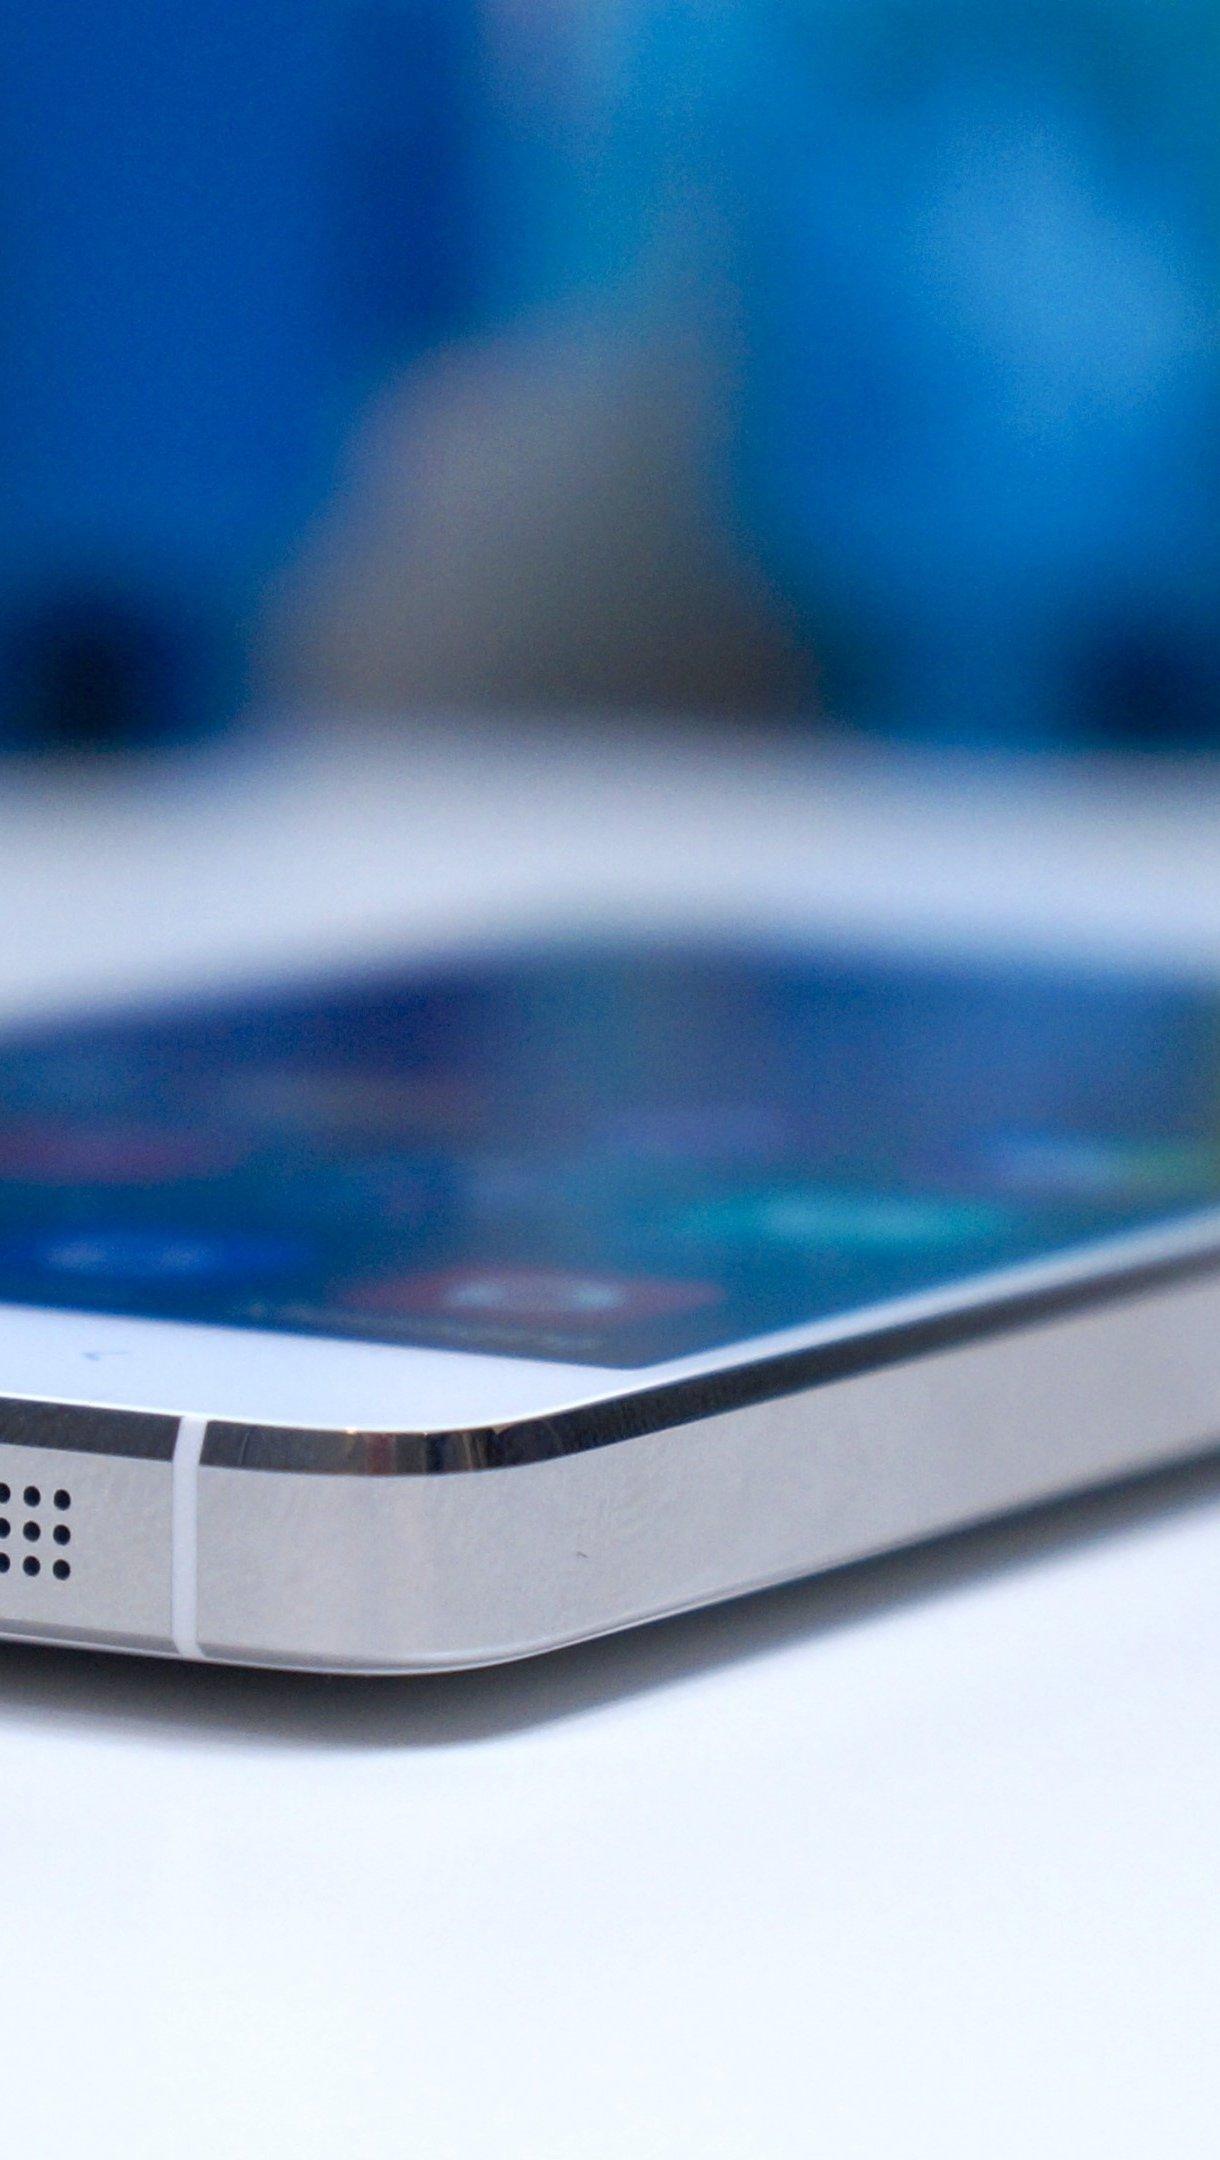 Wallpaper Xiaomi MI4 Smartphone Vertical